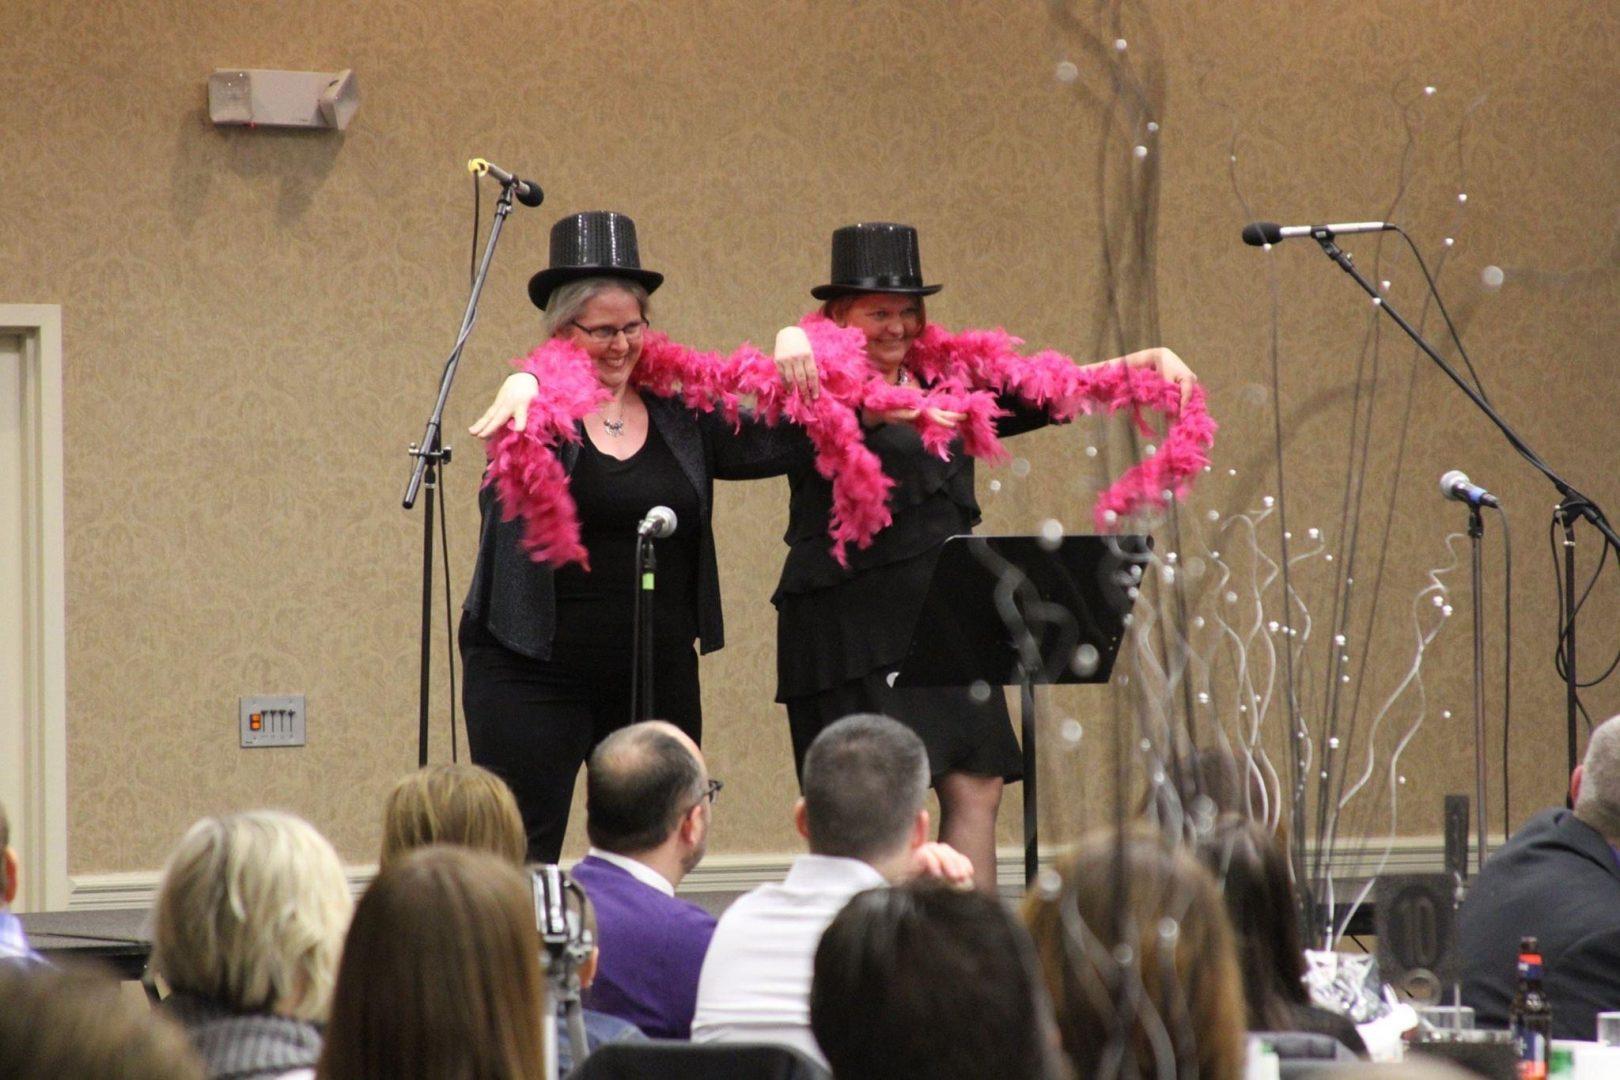 Gala Surprise Performance by Ann Tucker and Kim Scherrer